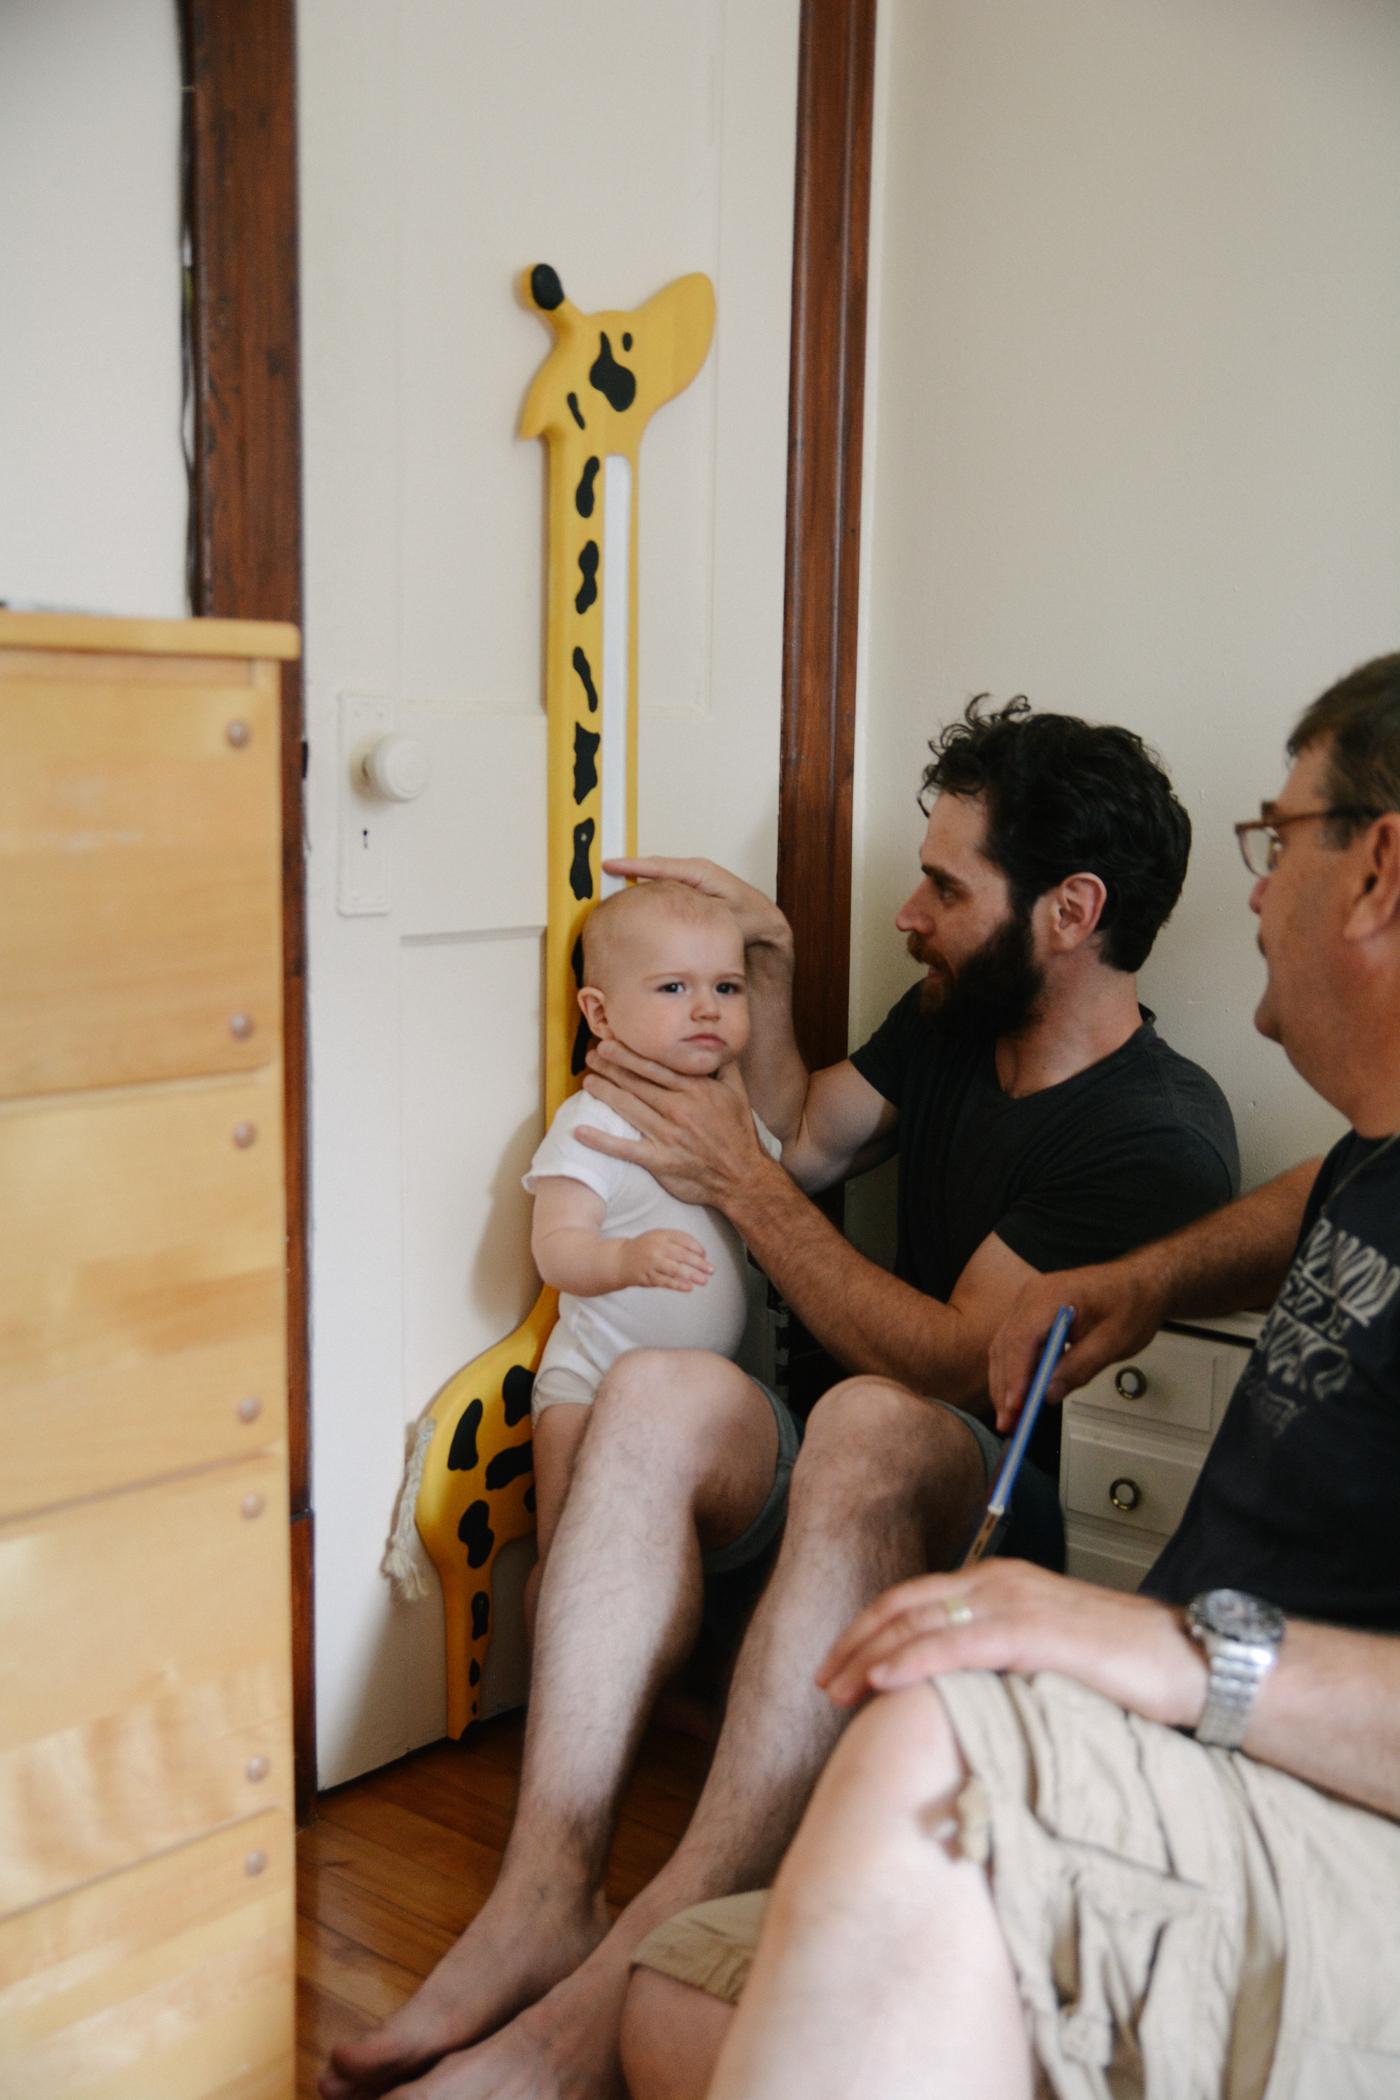 Bebe_toute_annee_Marianne_Charland_photographe_famille_nouveau-ne_enfant_Montreal_Basse-47.jpg